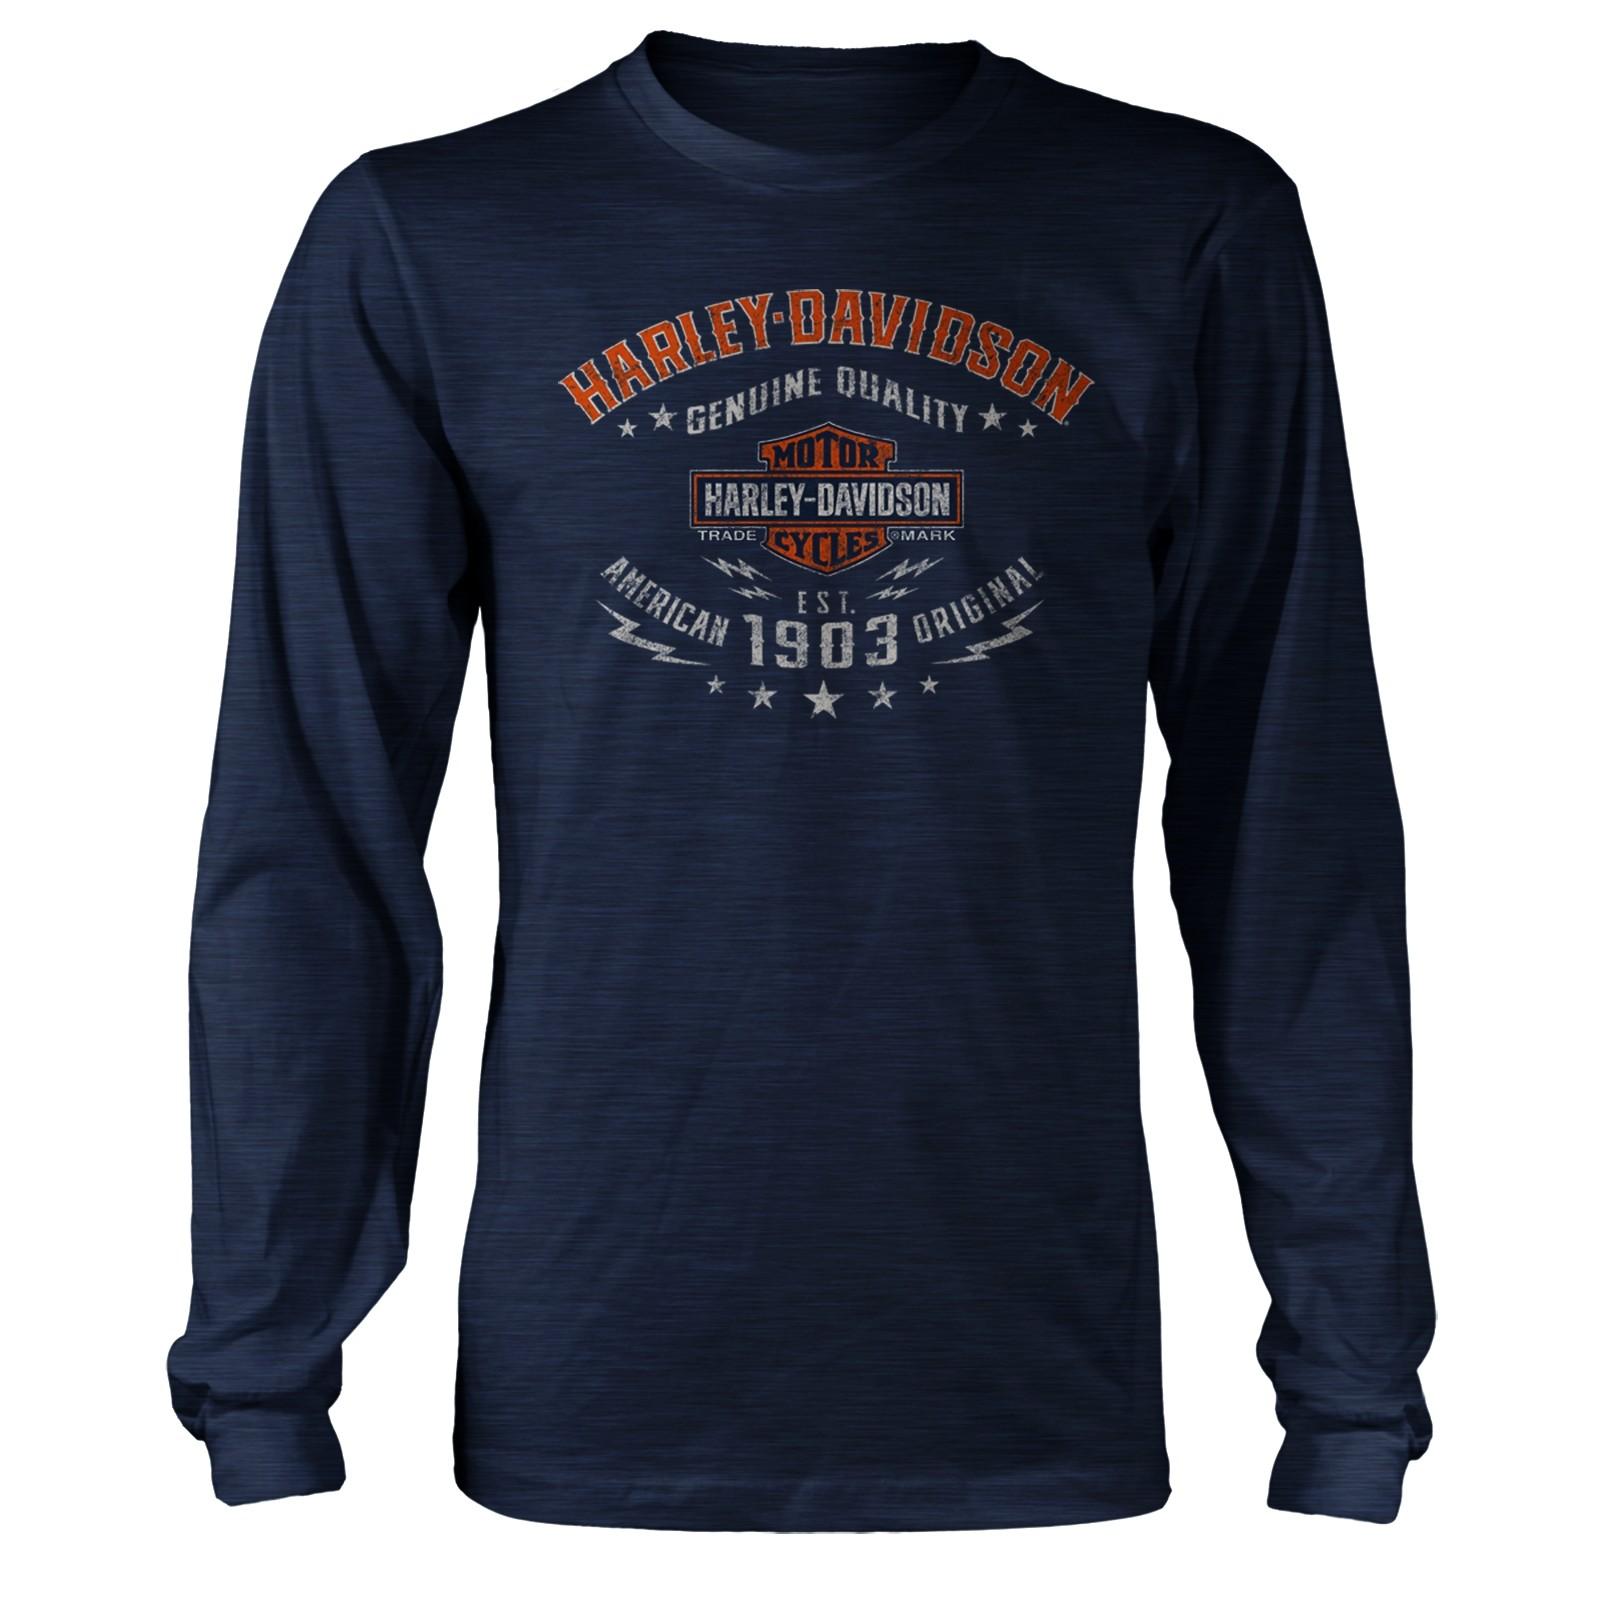 Men's Long-Sleeve Graphic T-Shirt - USAG Stuttgart   Street Ready